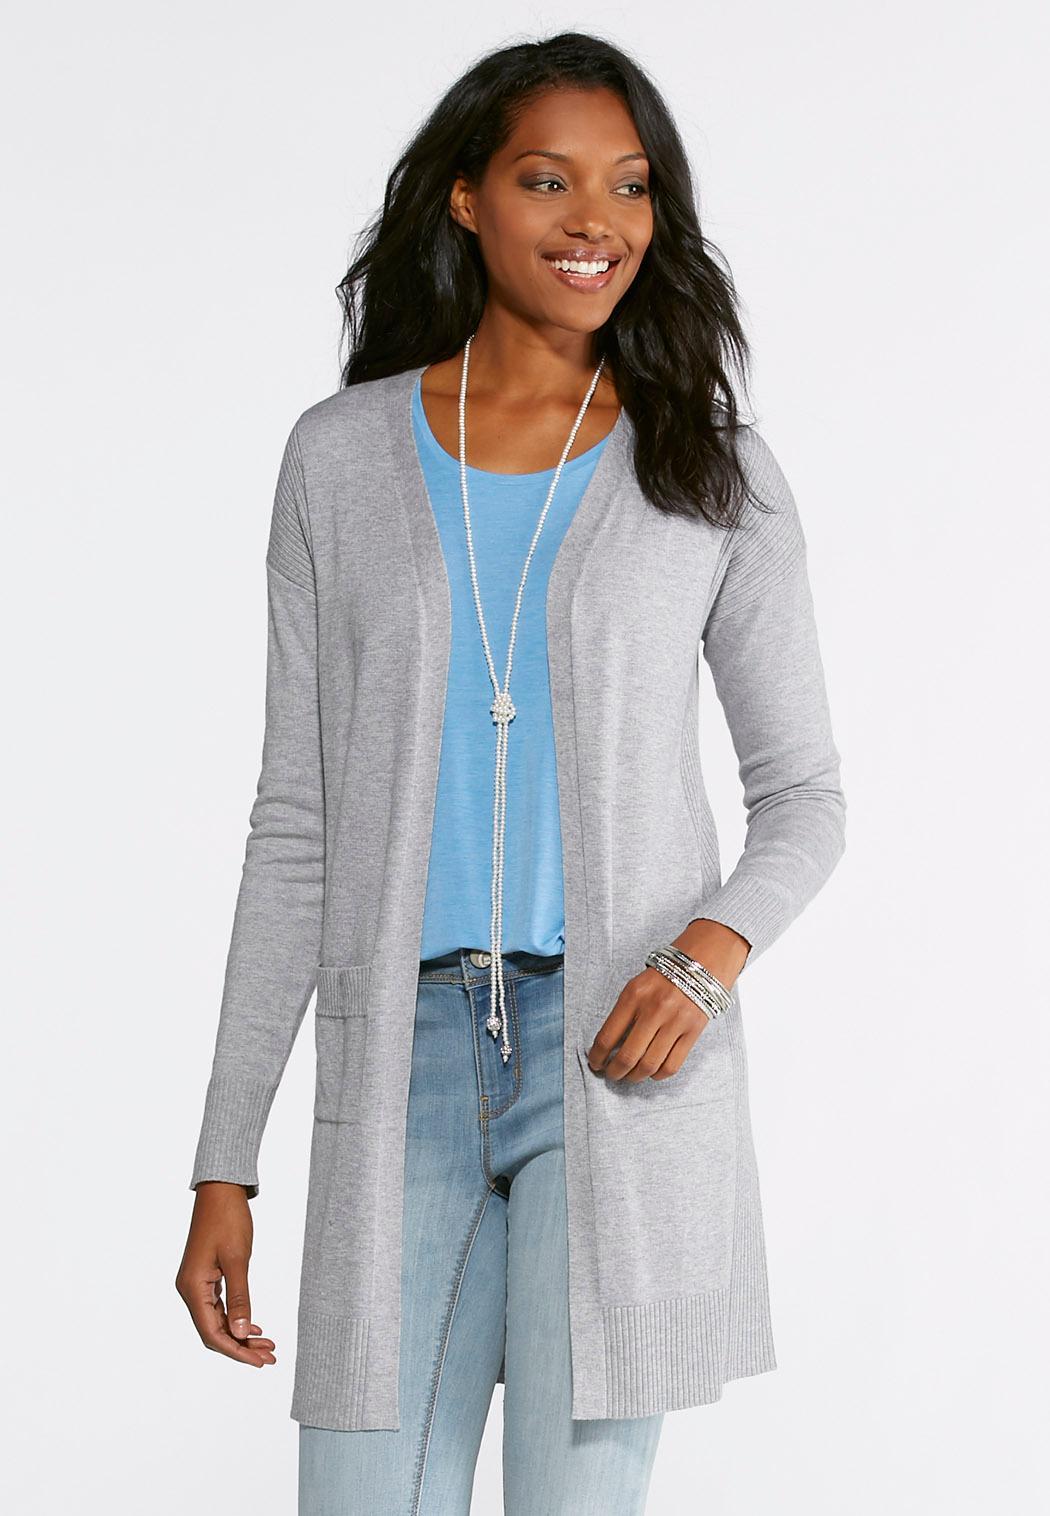 Ribbed Cardigan Sweater Cardigans & Shrugs Cato Fashions